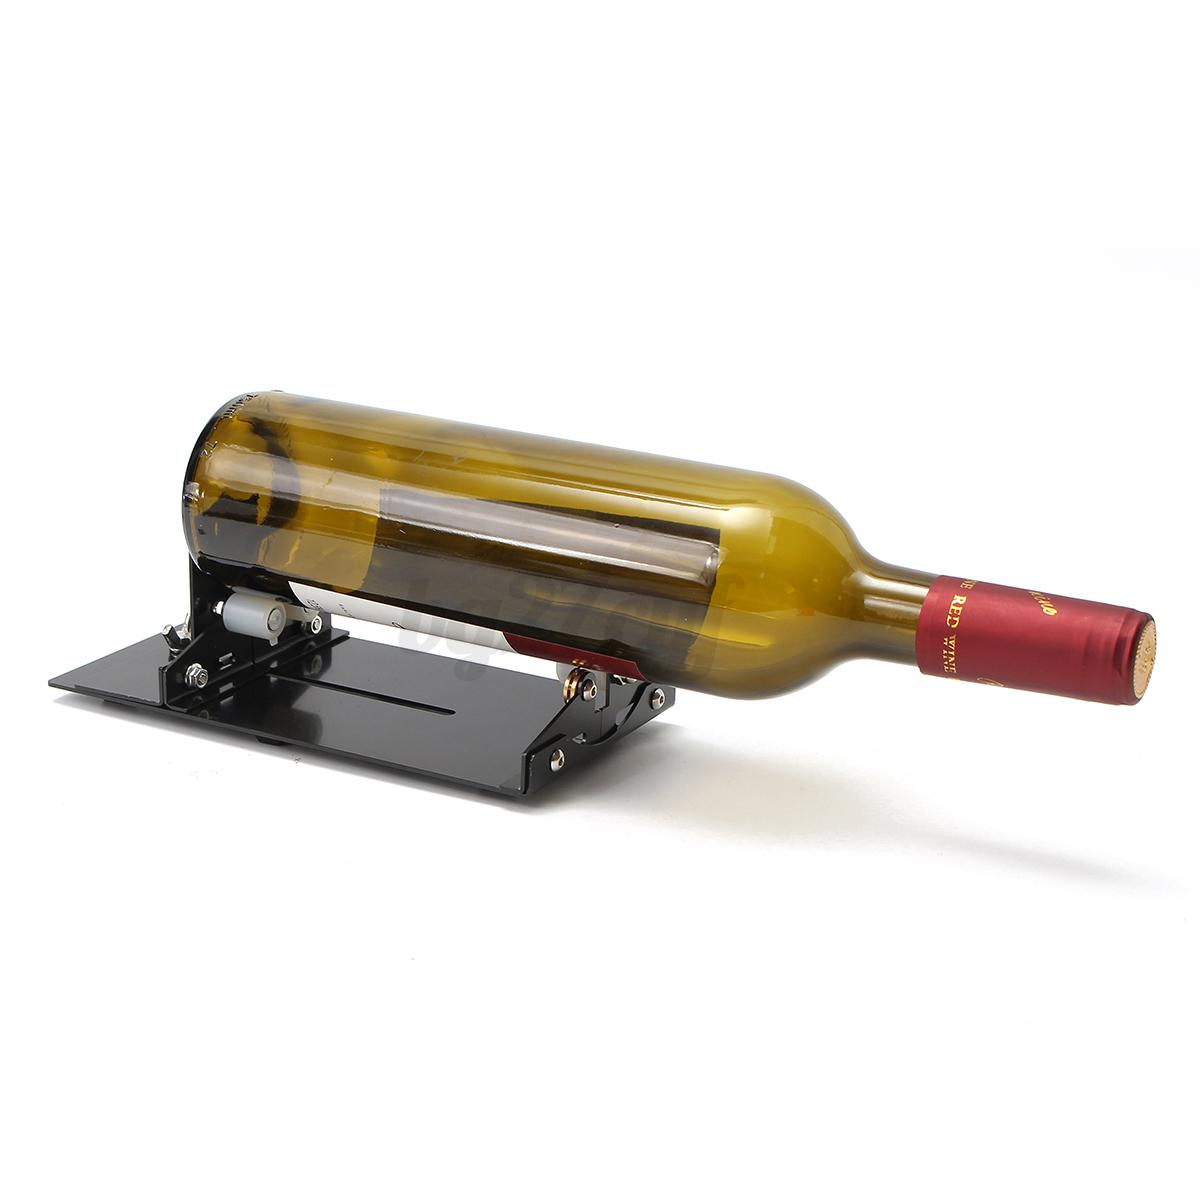 Glass diy bottle cutter wine bottles jar cutting machine for Glass cutter for wine bottles